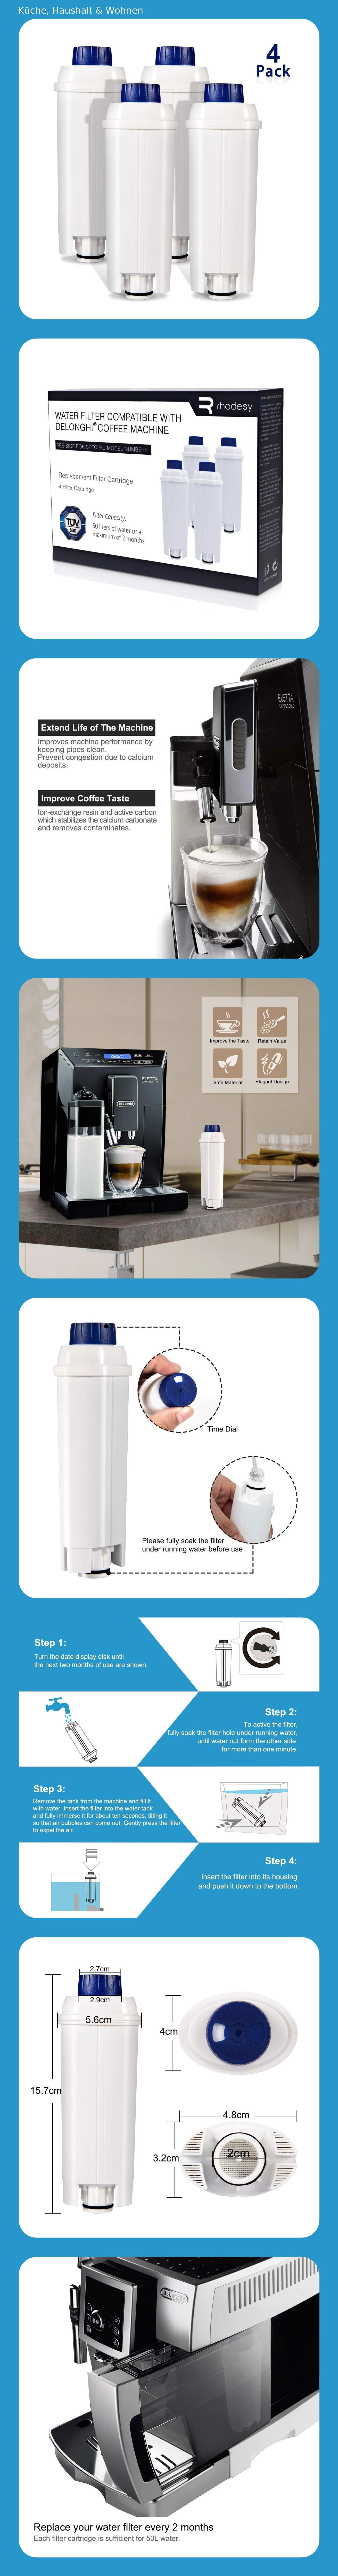 Rhodesy Wasserfilter Fur Delongie Kaffeemaschinen Dlsc002